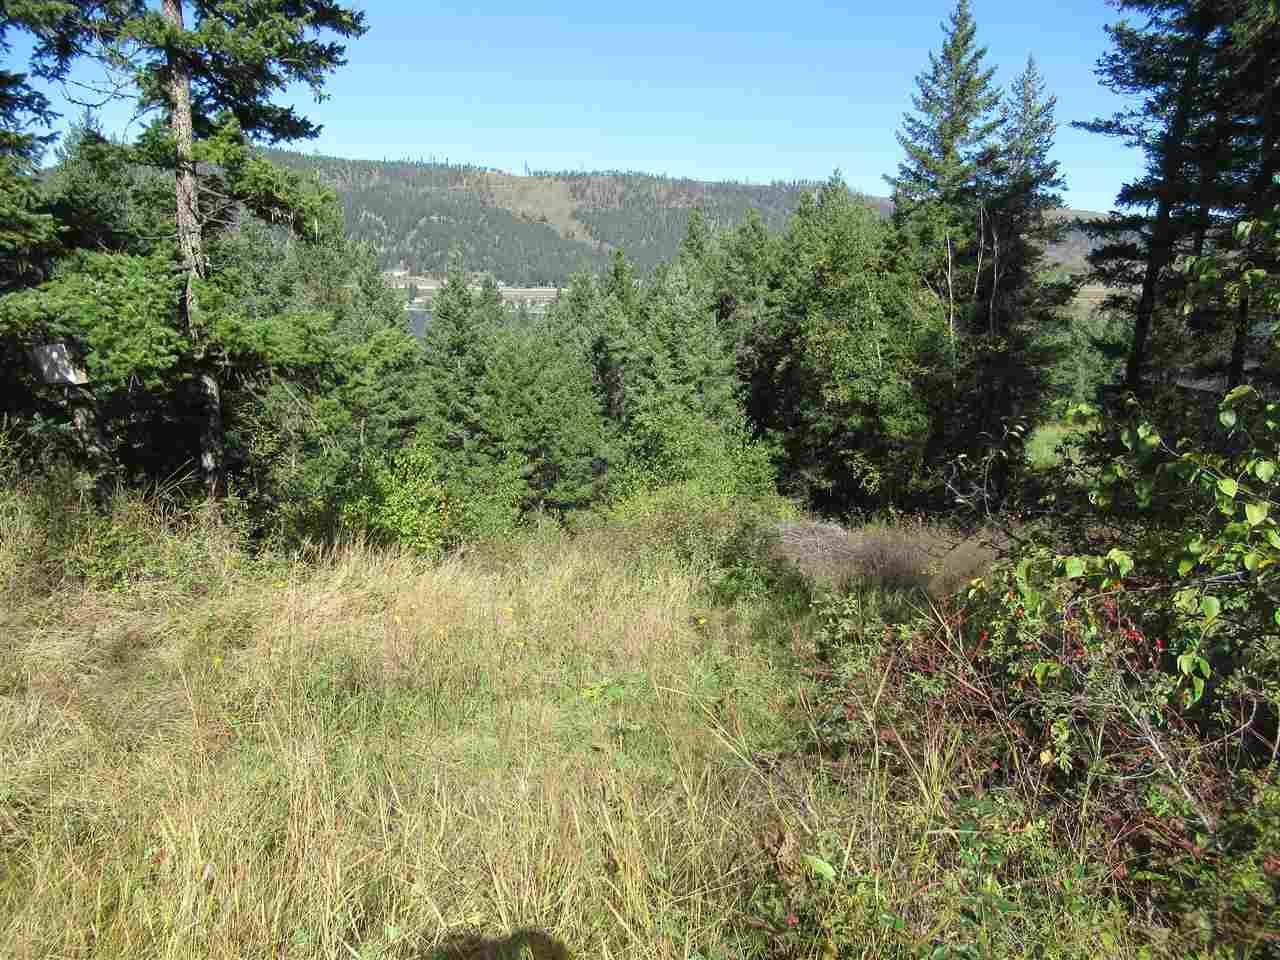 Main Photo: 2136 KINGLET Road in Williams Lake: Lakeside Rural Land for sale (Williams Lake (Zone 27))  : MLS®# R2501615